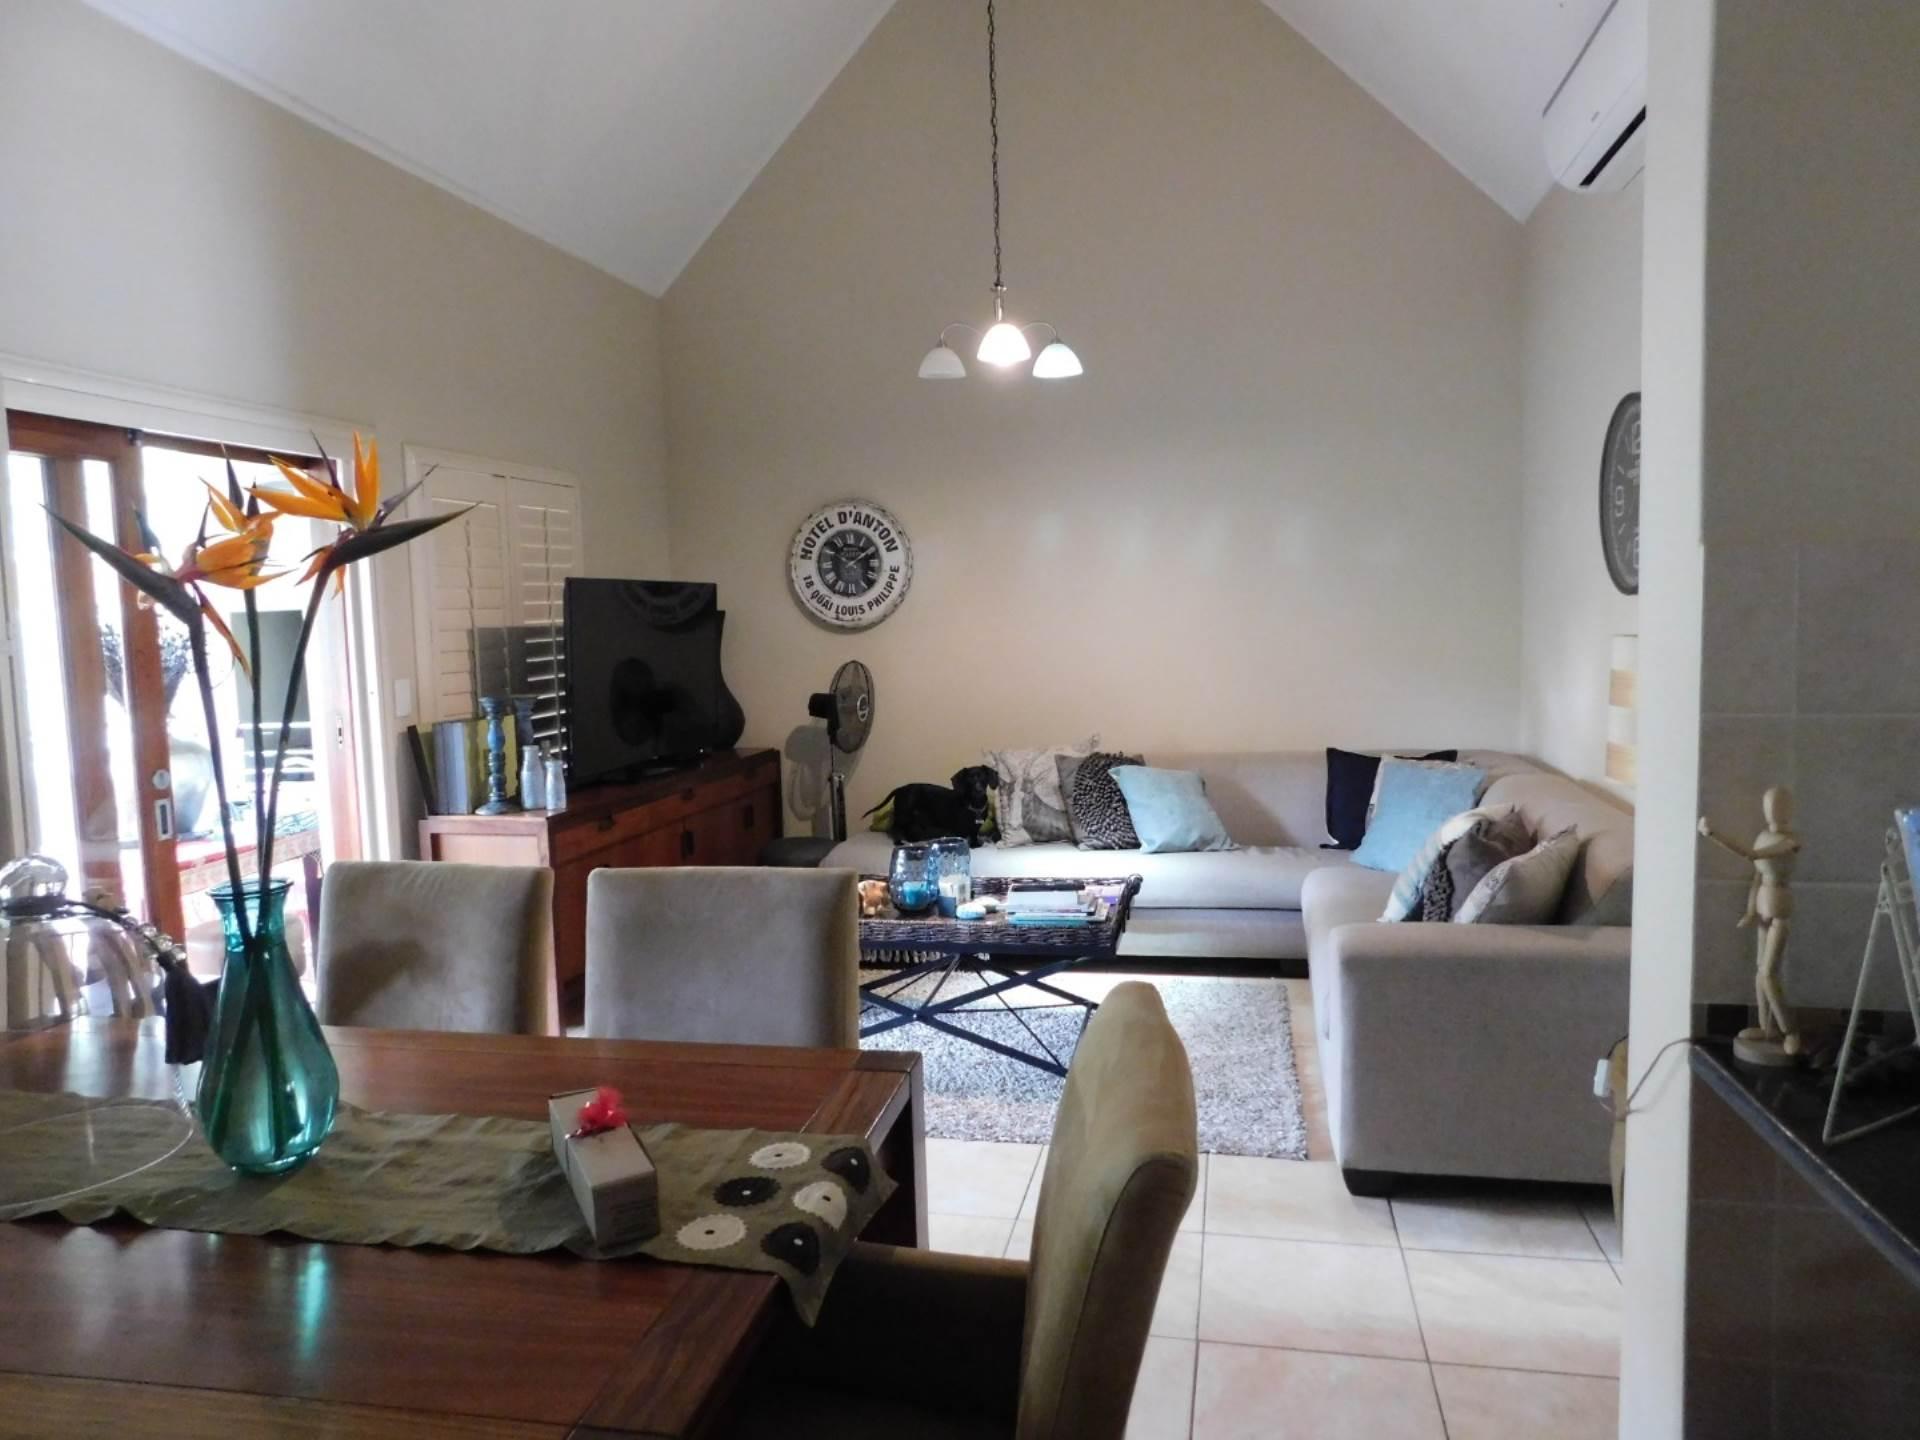 Retirement Village To Rent In Olympus A H, Pretoria, Gauteng for R